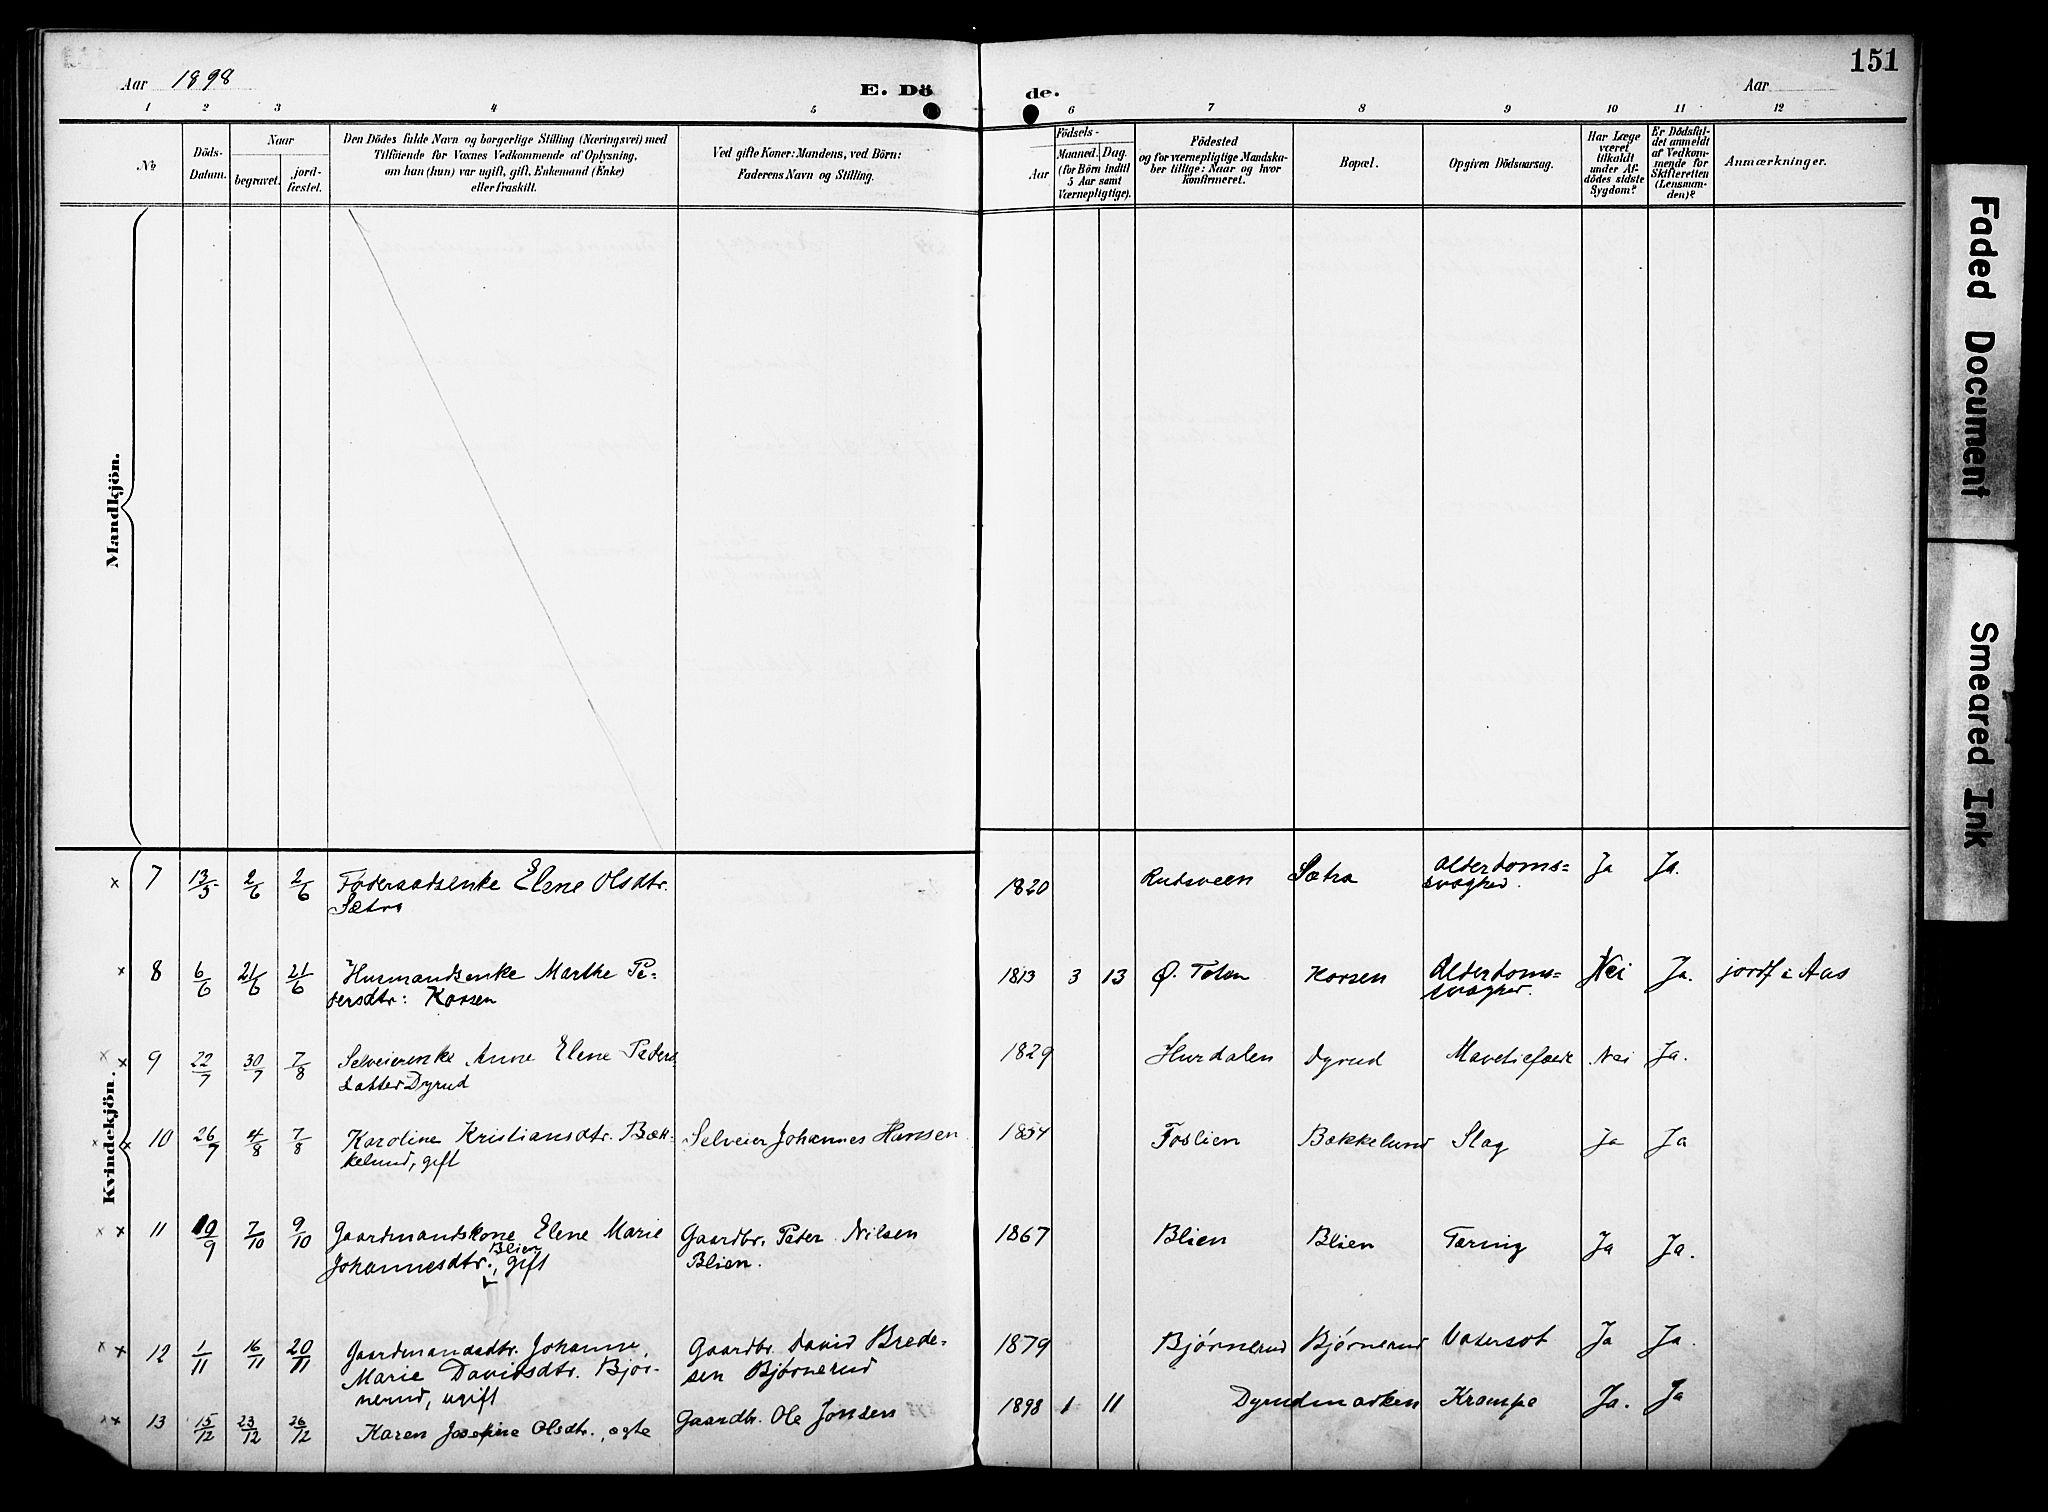 SAH, Vestre Toten prestekontor, H/Ha/Haa/L0012: Ministerialbok nr. 12, 1890-1906, s. 151